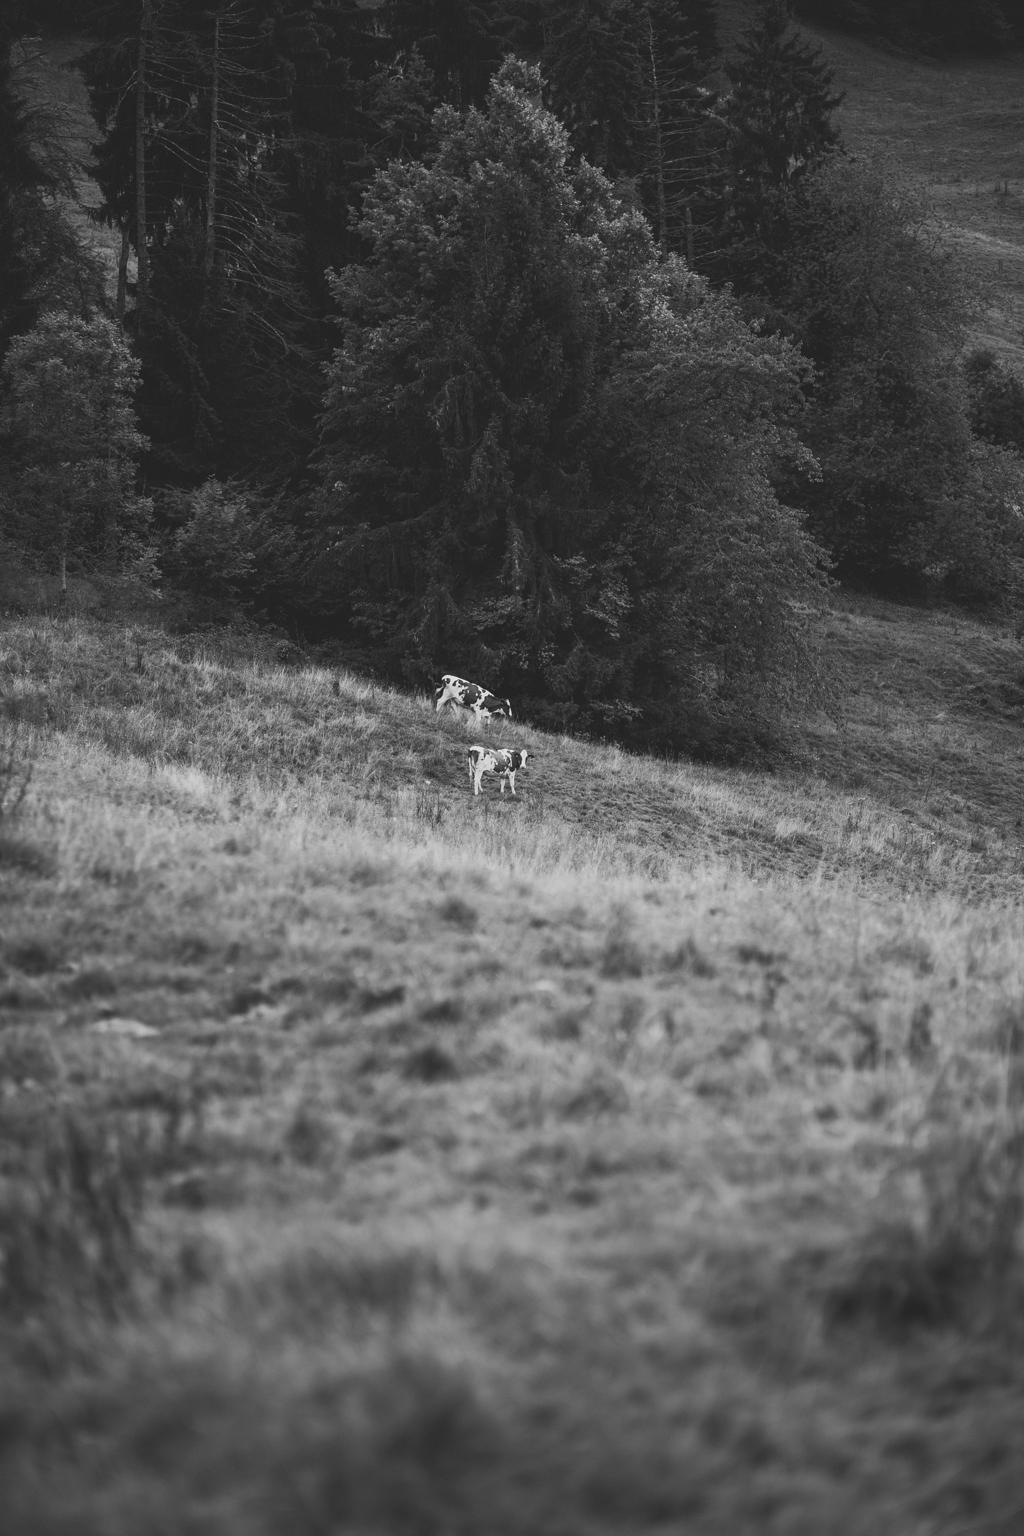 capyture-photographe-alsace-haut-rhin-143